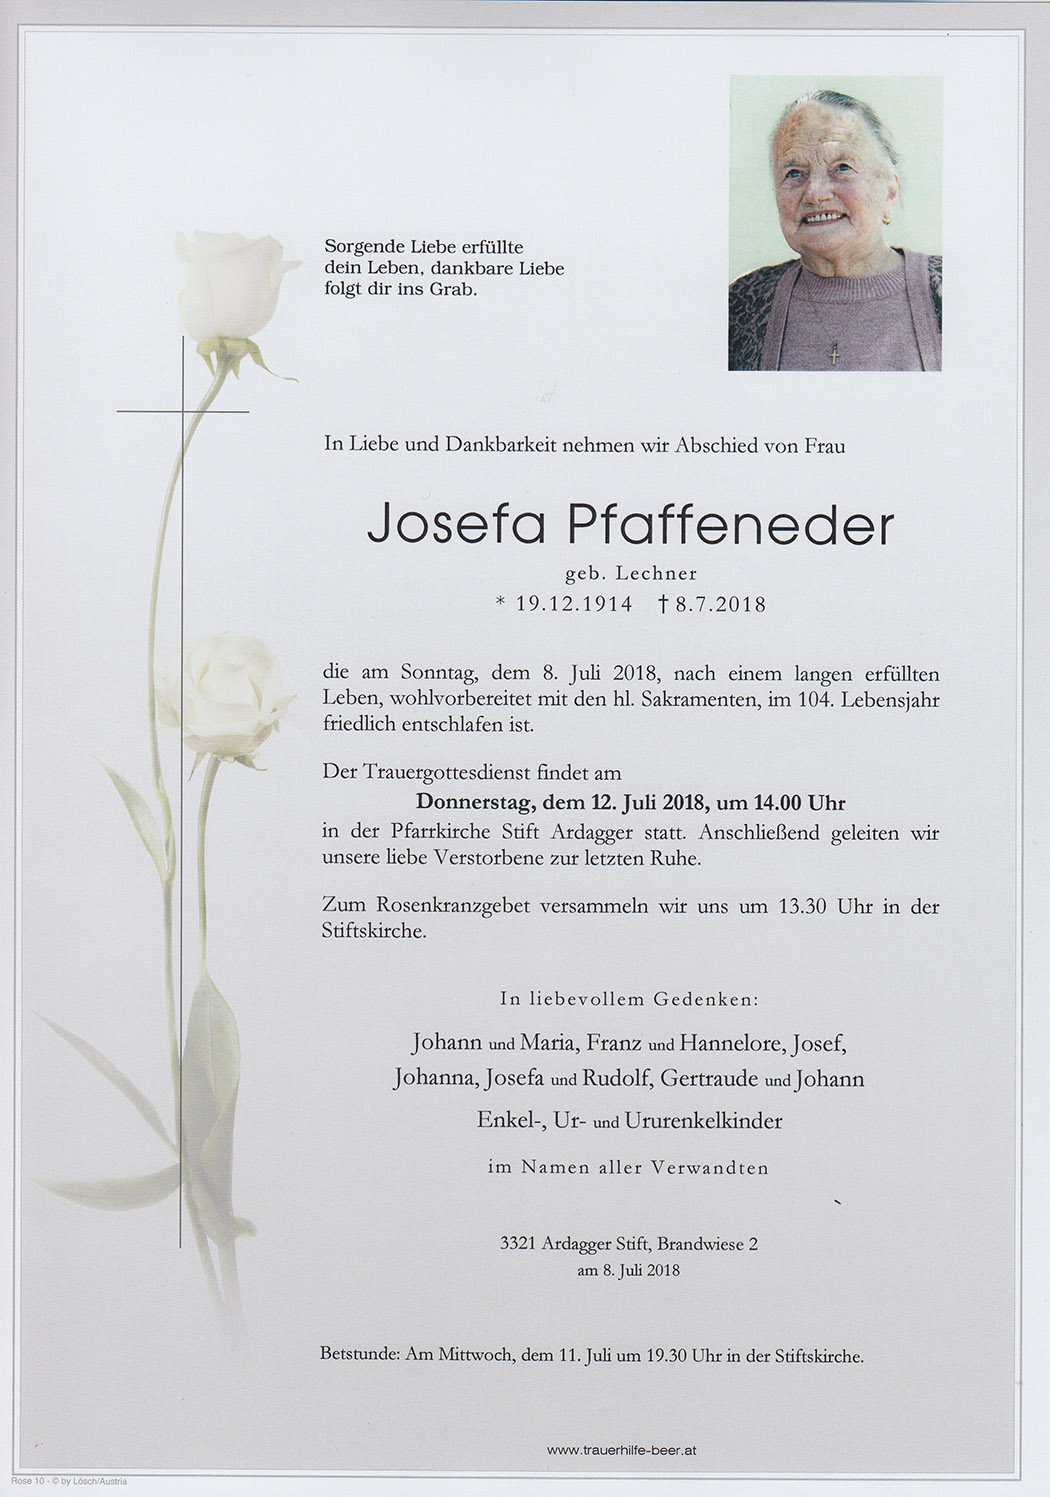 Josefa Paffeneder